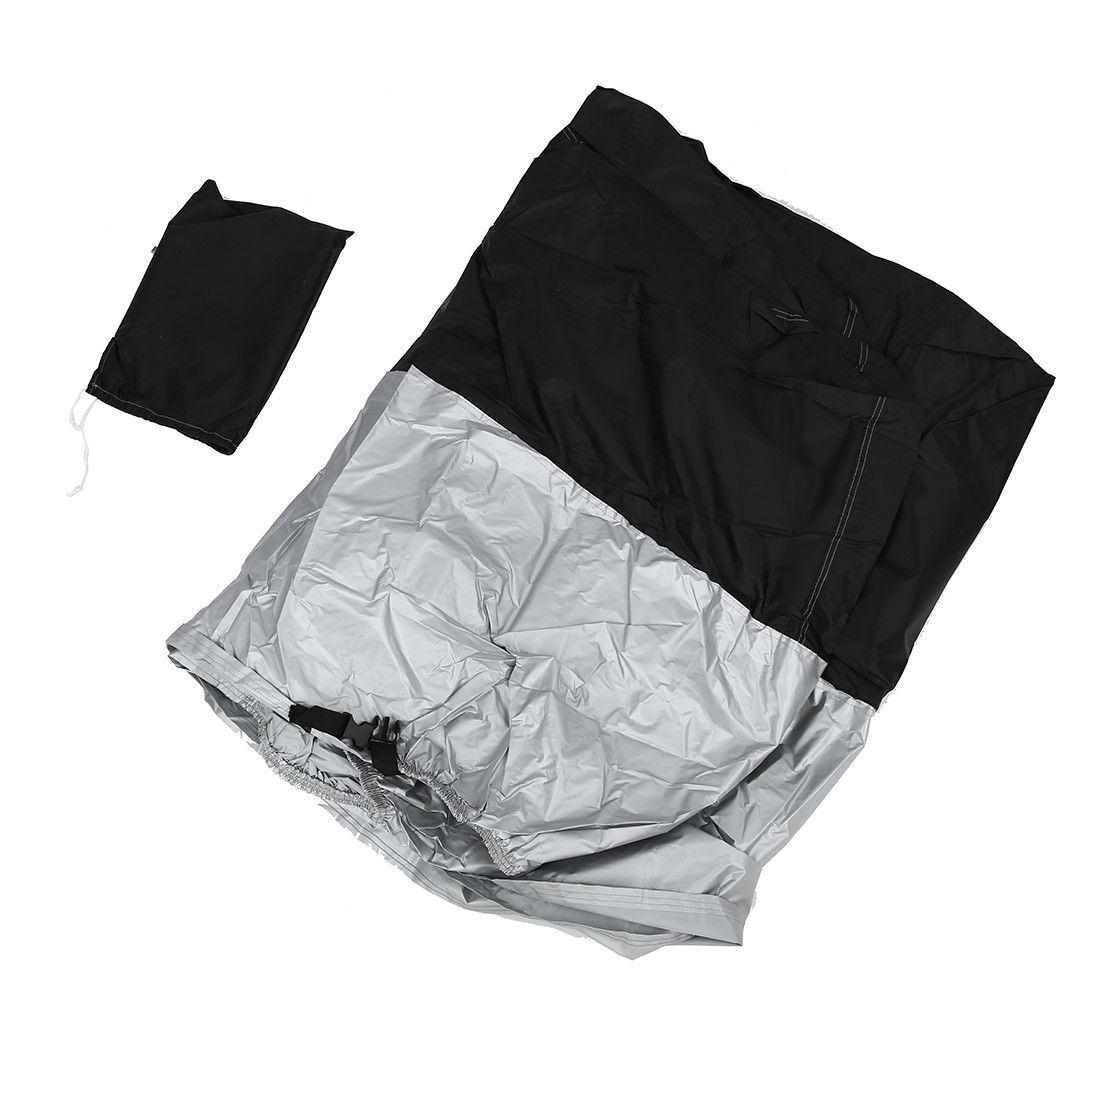 Funda-Impermeable-Protectora-Cubre-Moto-Cosida-Muy-Resistente-Tallas-M-XXL miniatura 4